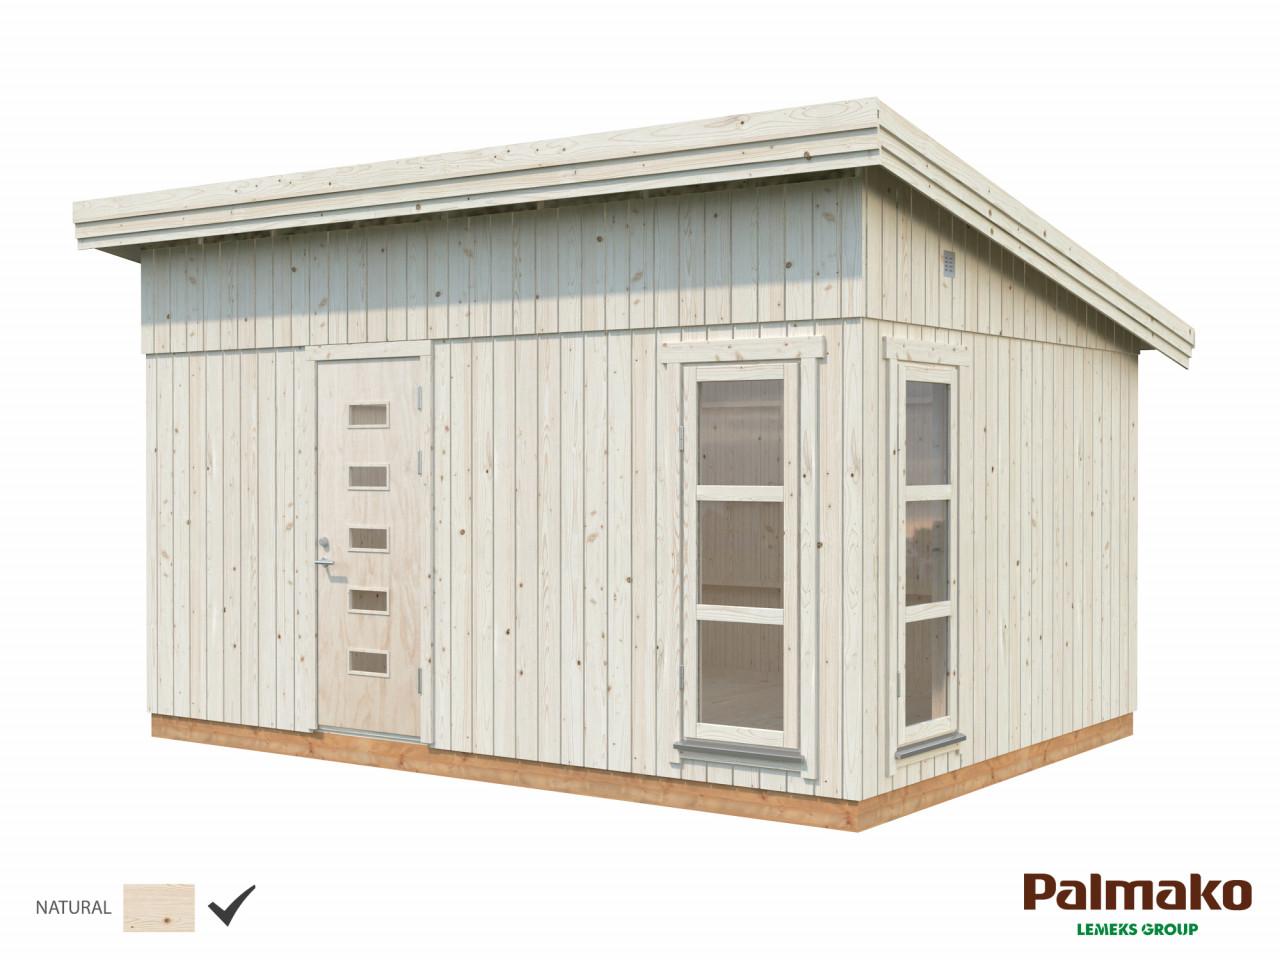 Palmako Nordic Pultdach Gartenhaus Etta 13,8 m²